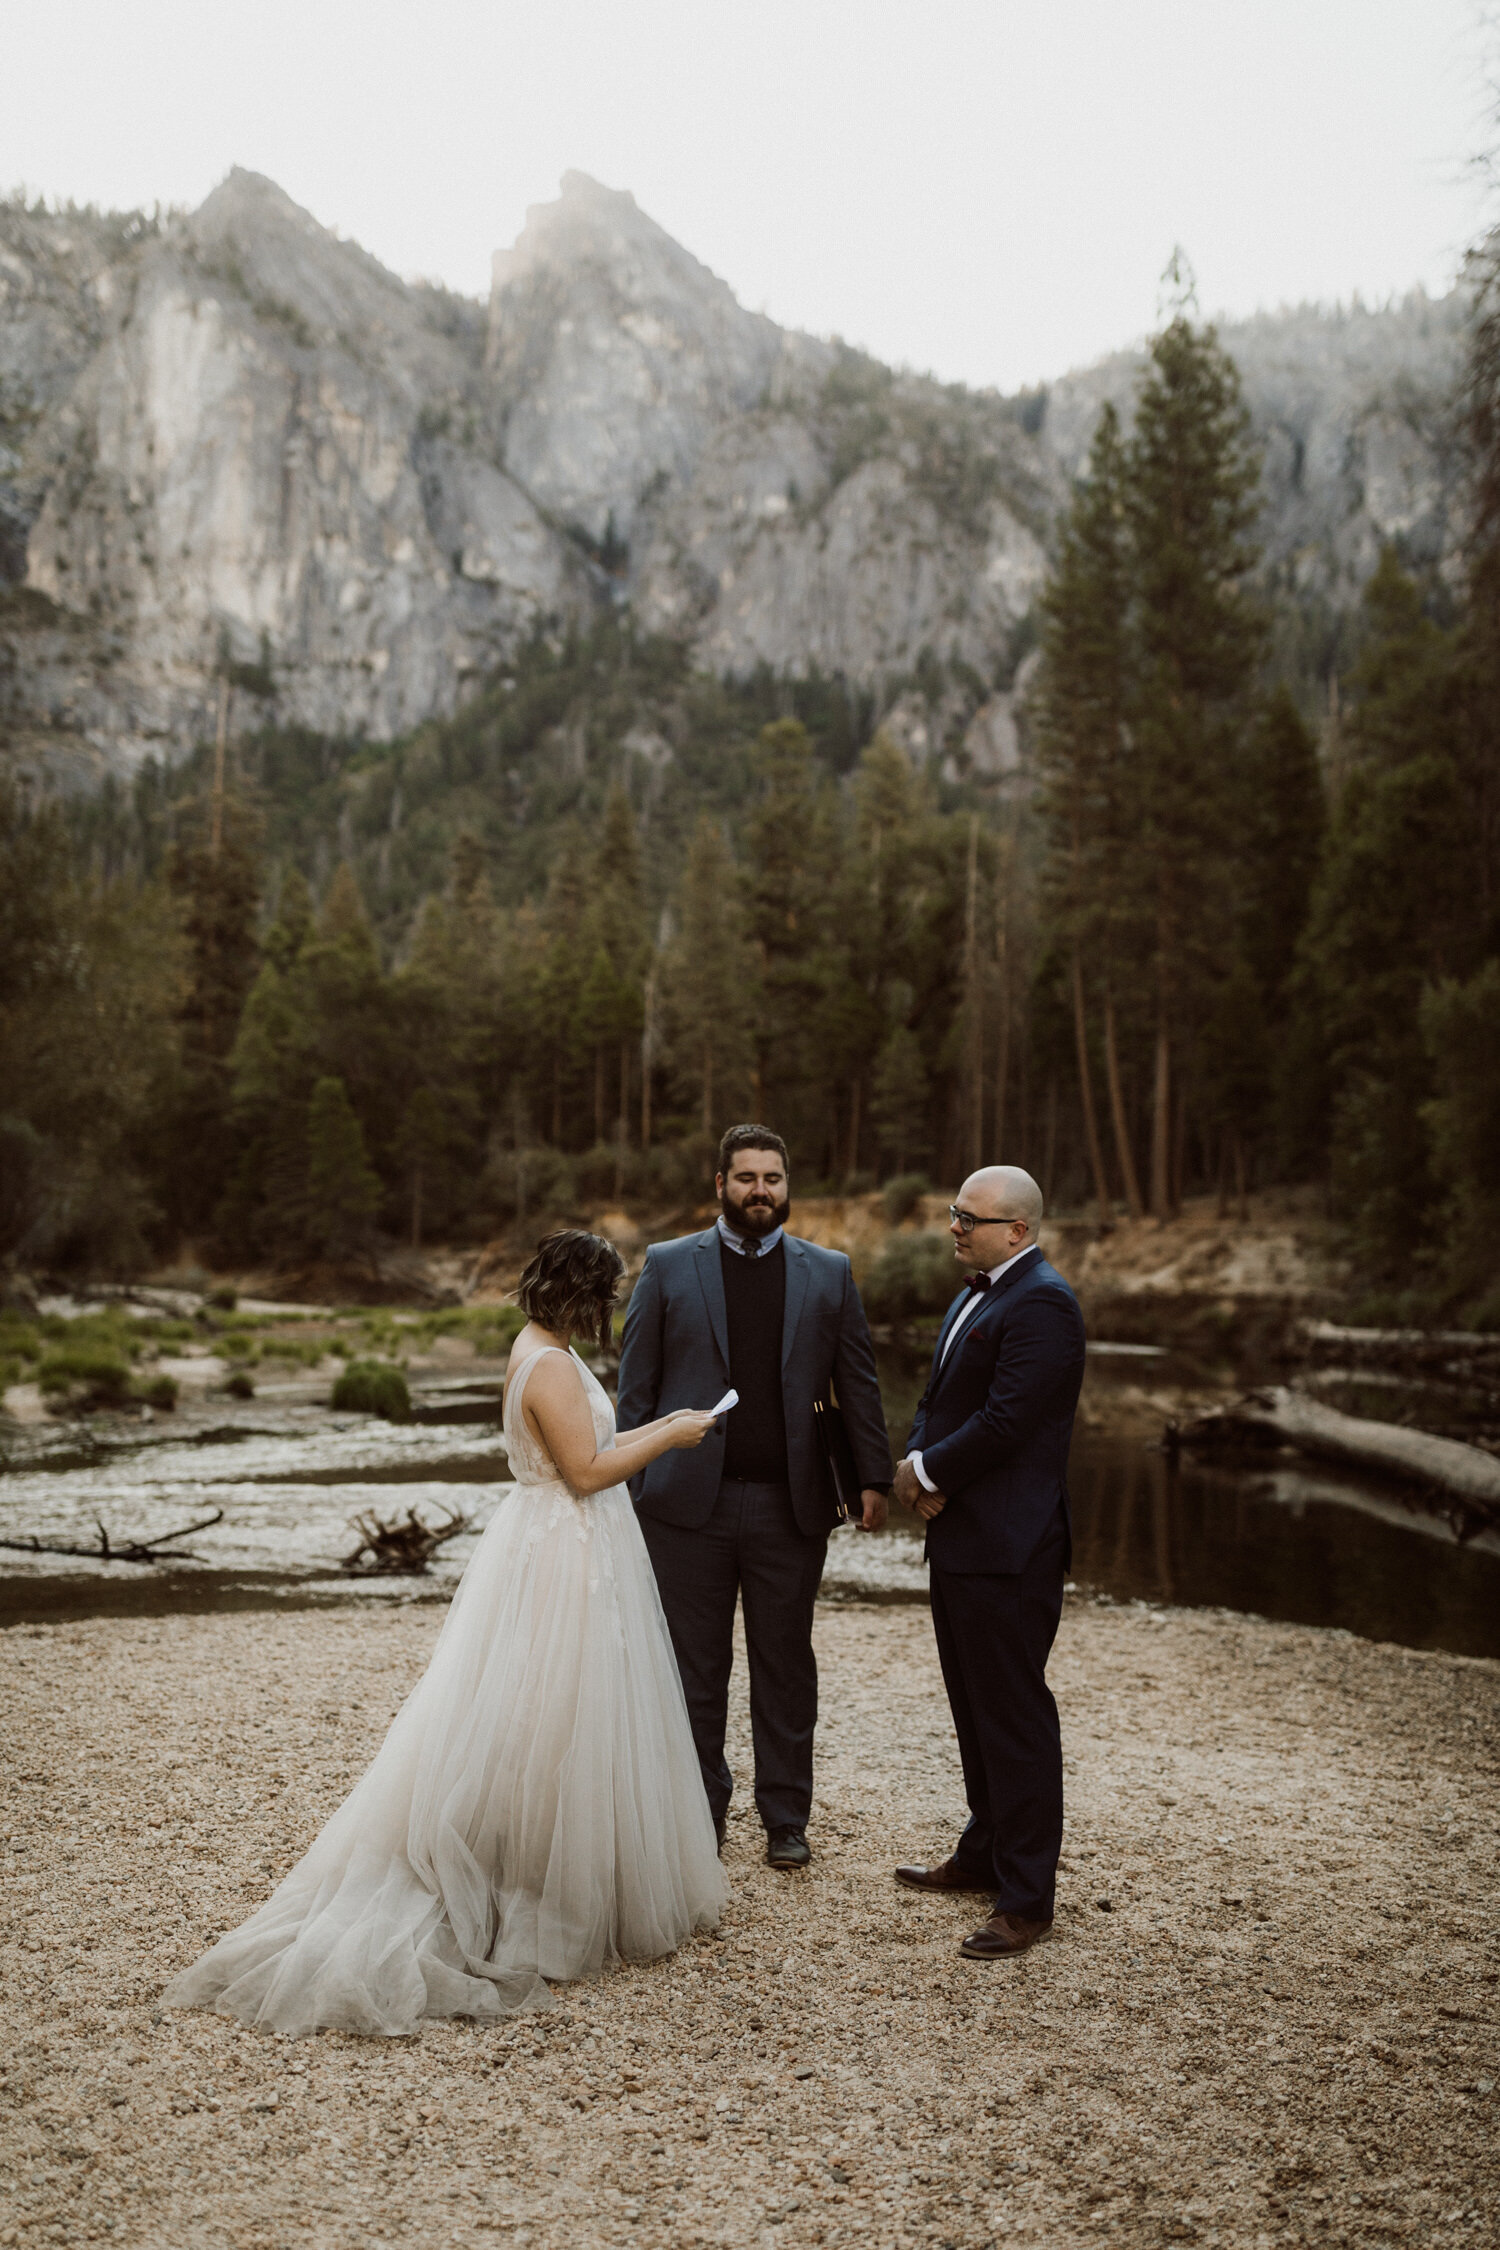 adventure-wedding-yosemite-national-park-17.jpg